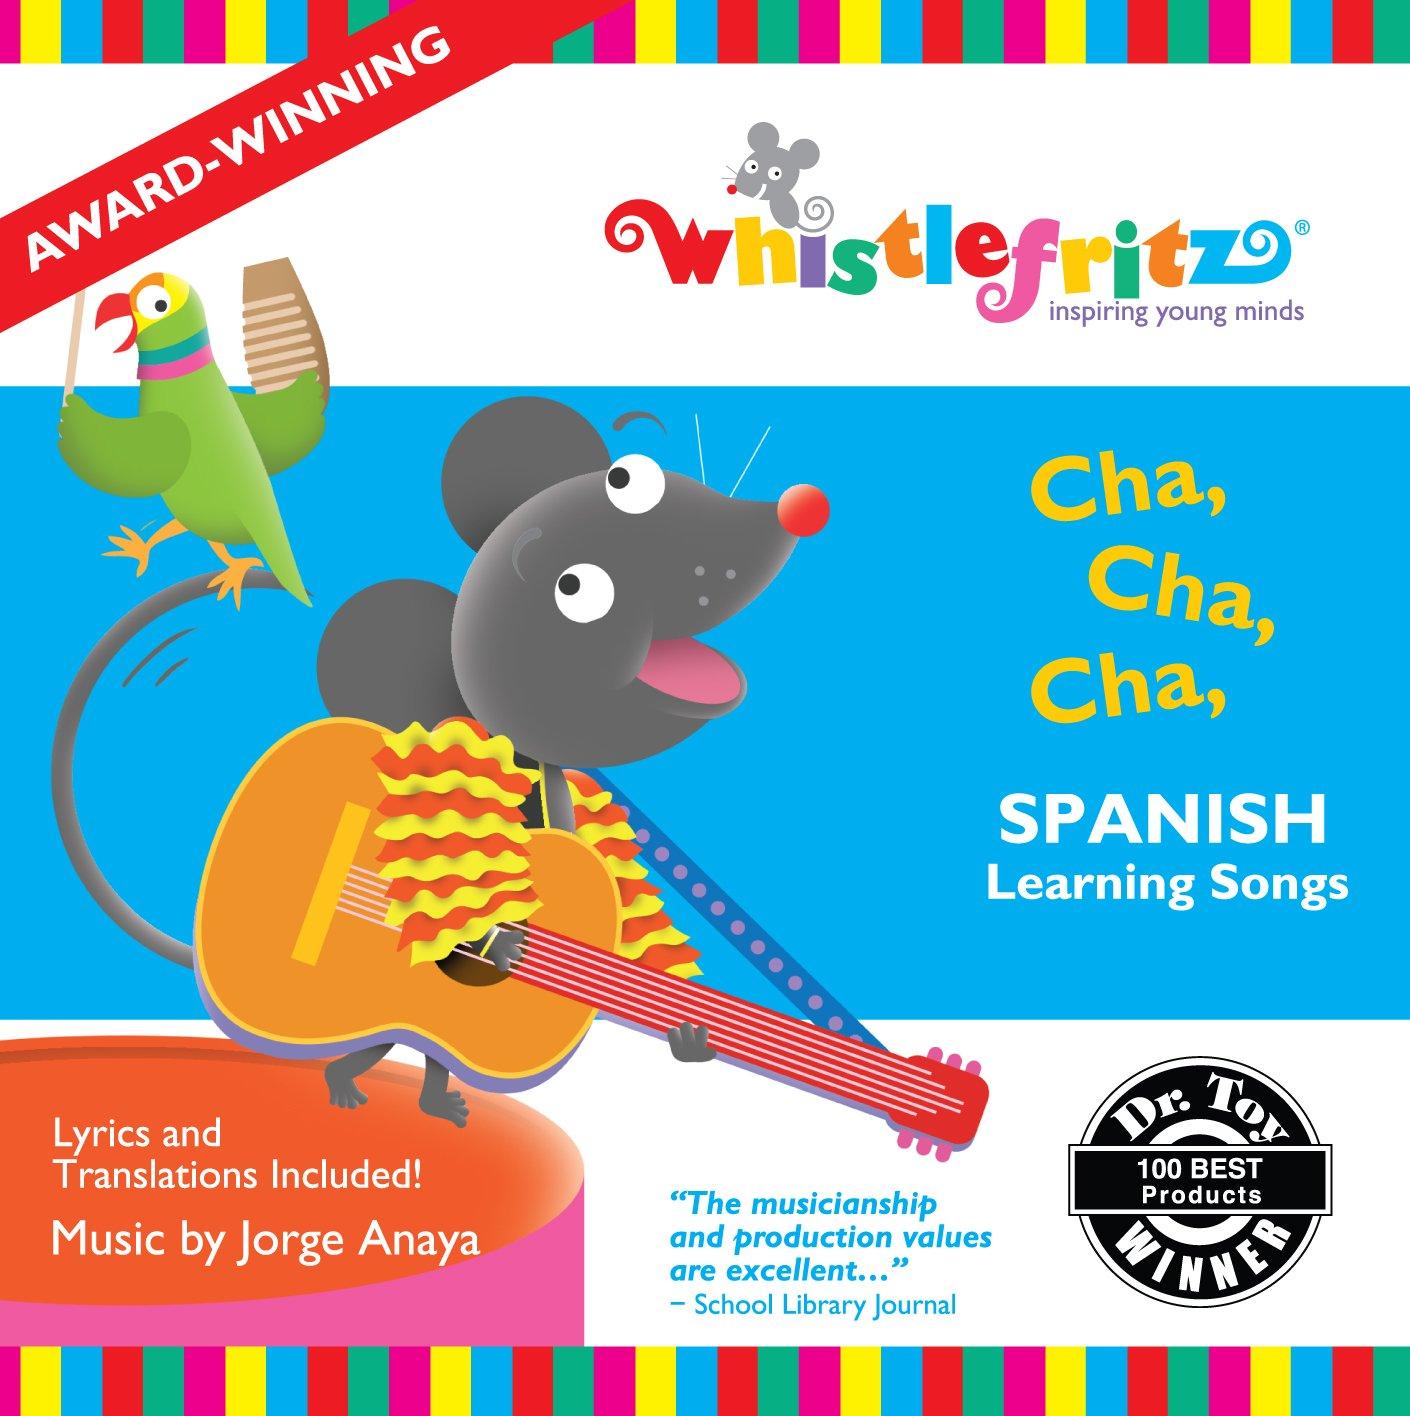 Cha, Cha, Cha -- Spanish Learning Songs Canciones Infantiles